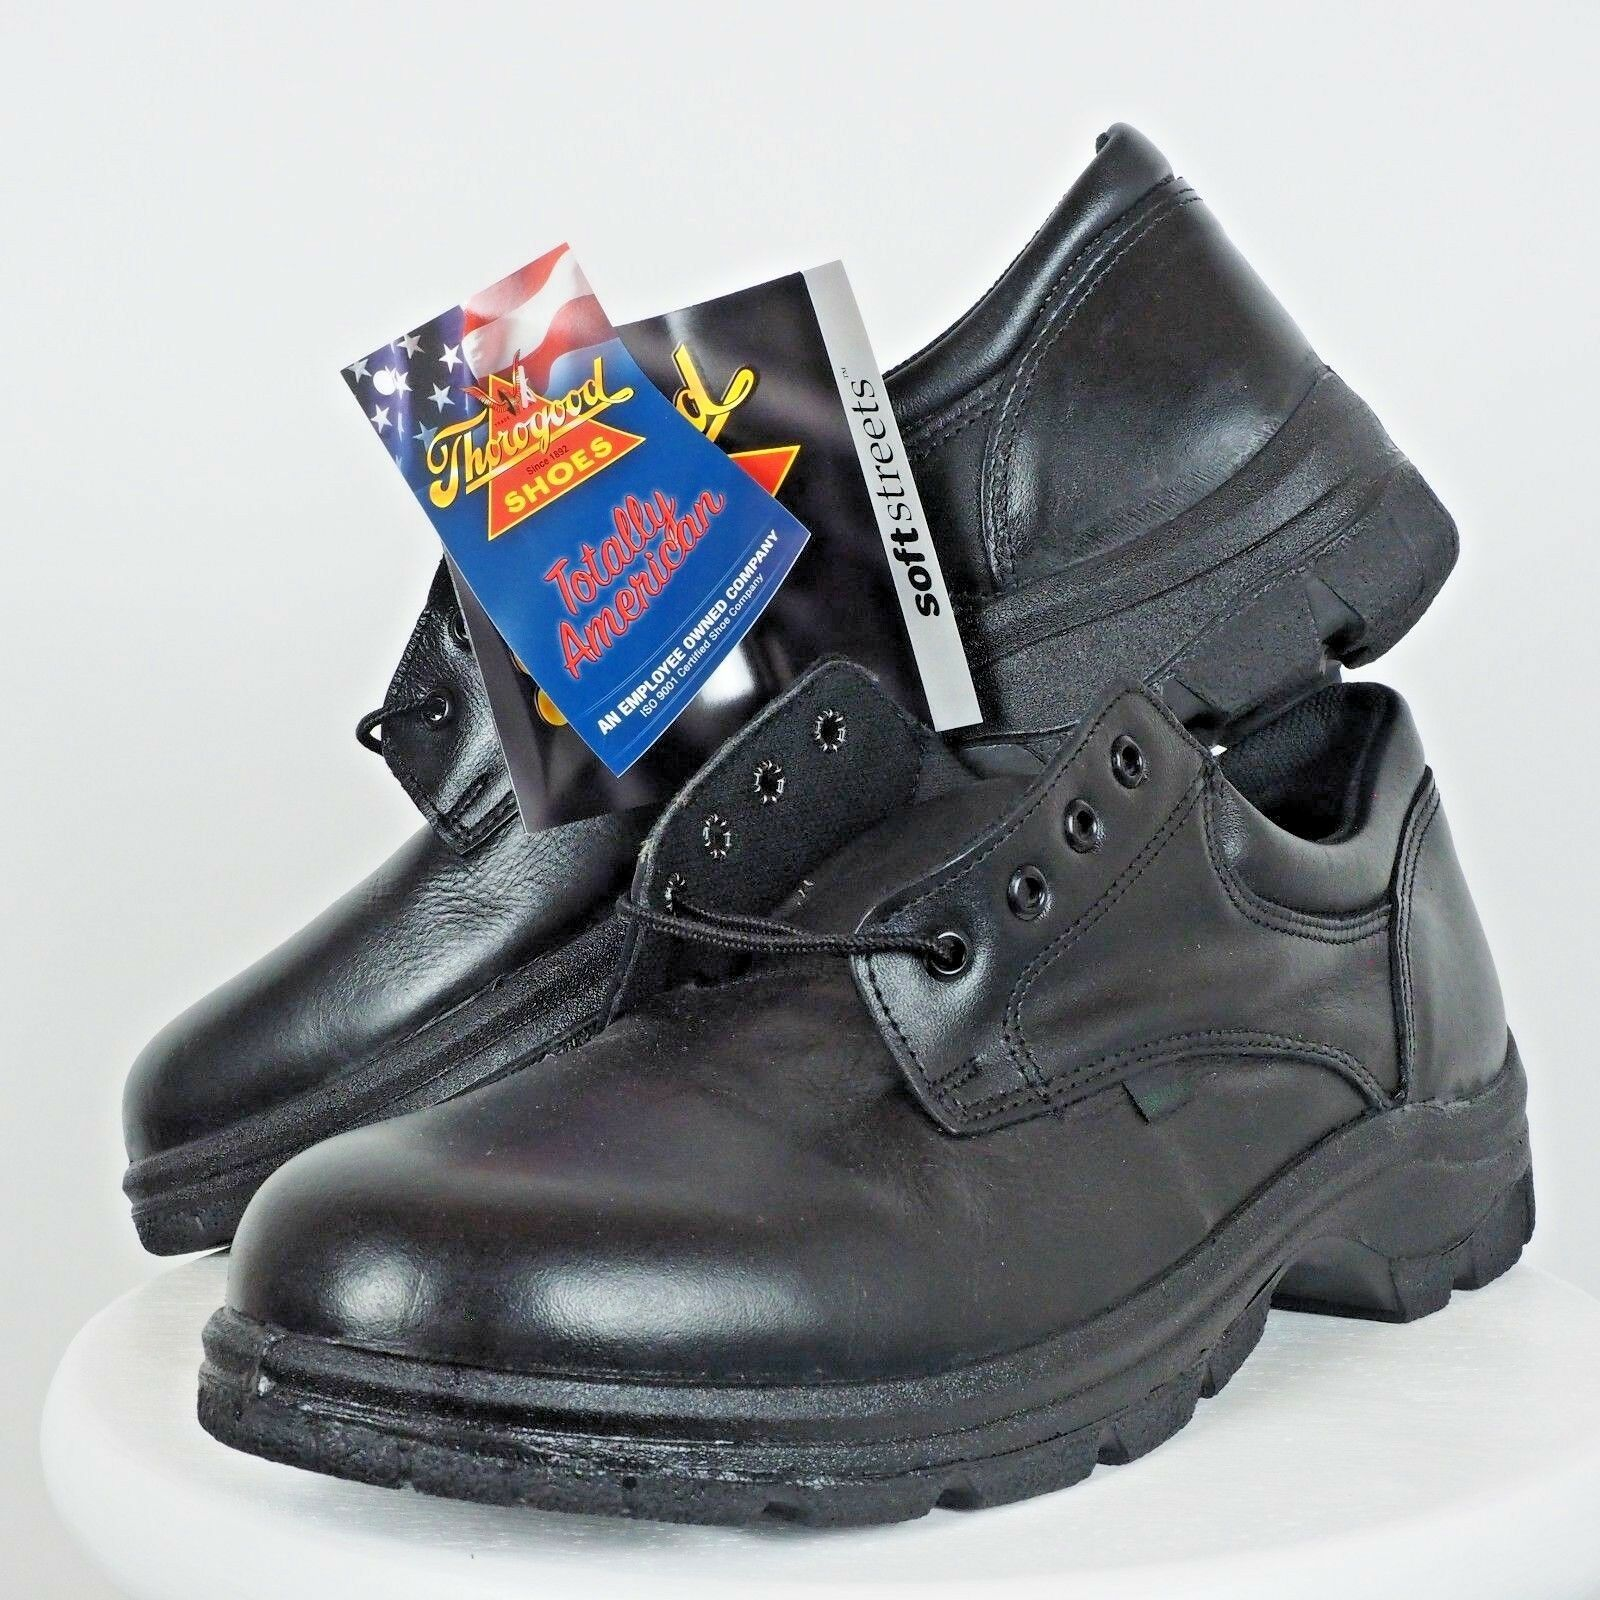 Scarpe casual da uomo  Thorogood 834-6905 USA Resistant Made Postal Certified Slip Resistant USA Oxford Size 14 M 41303a